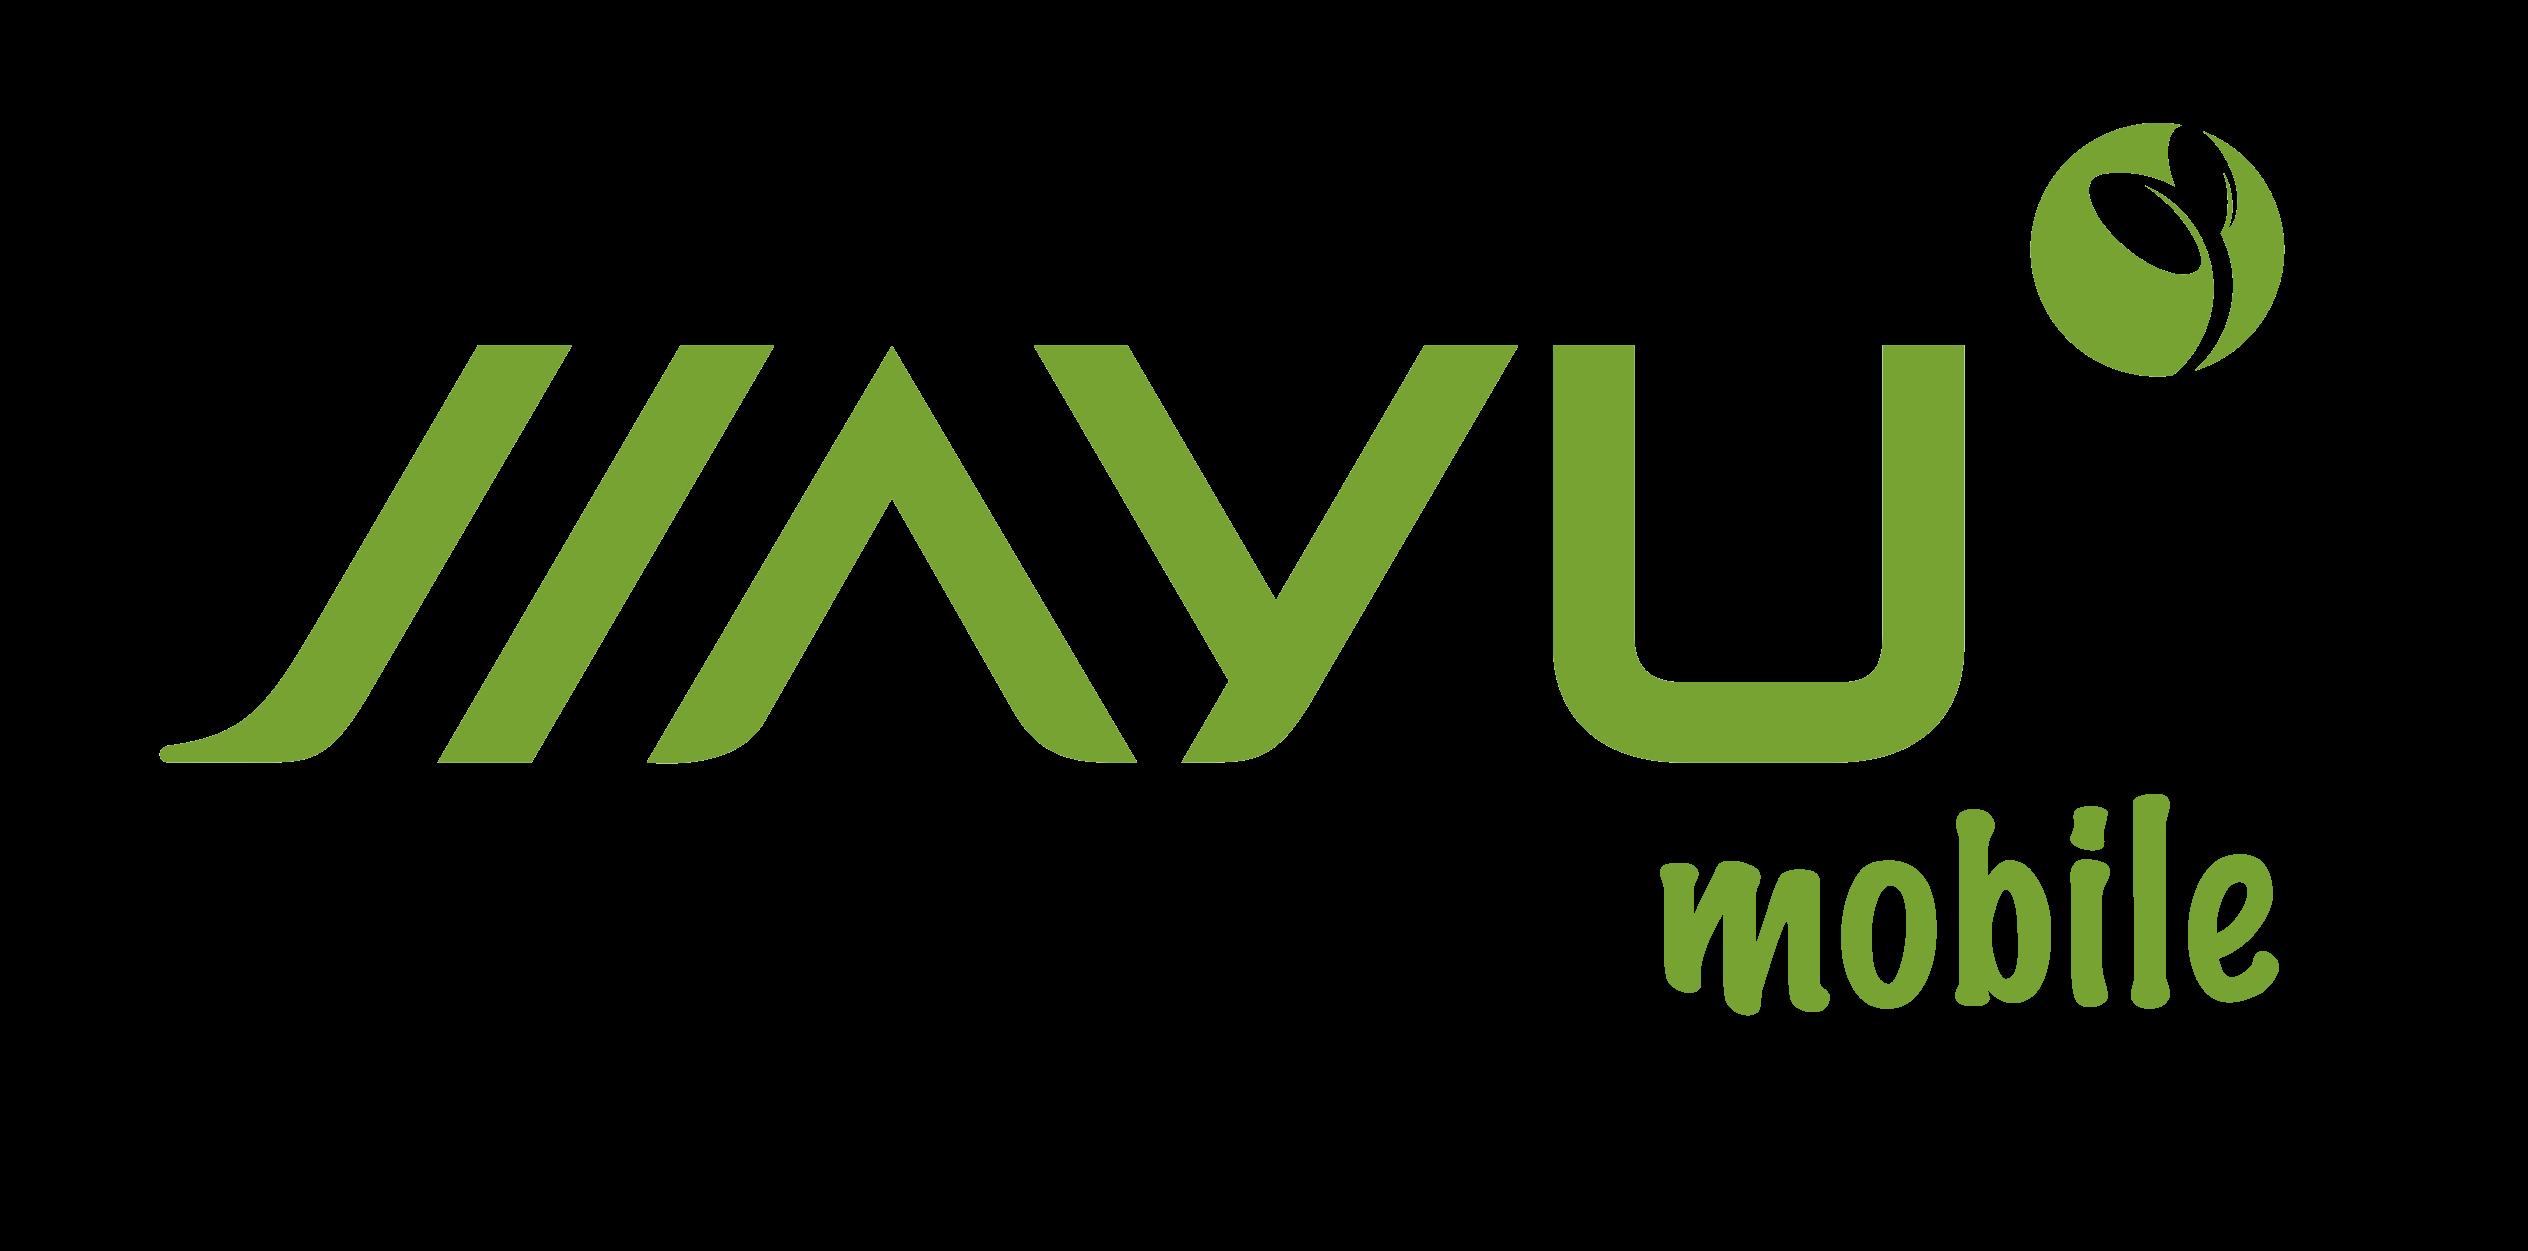 Jiayu Mobile Logo